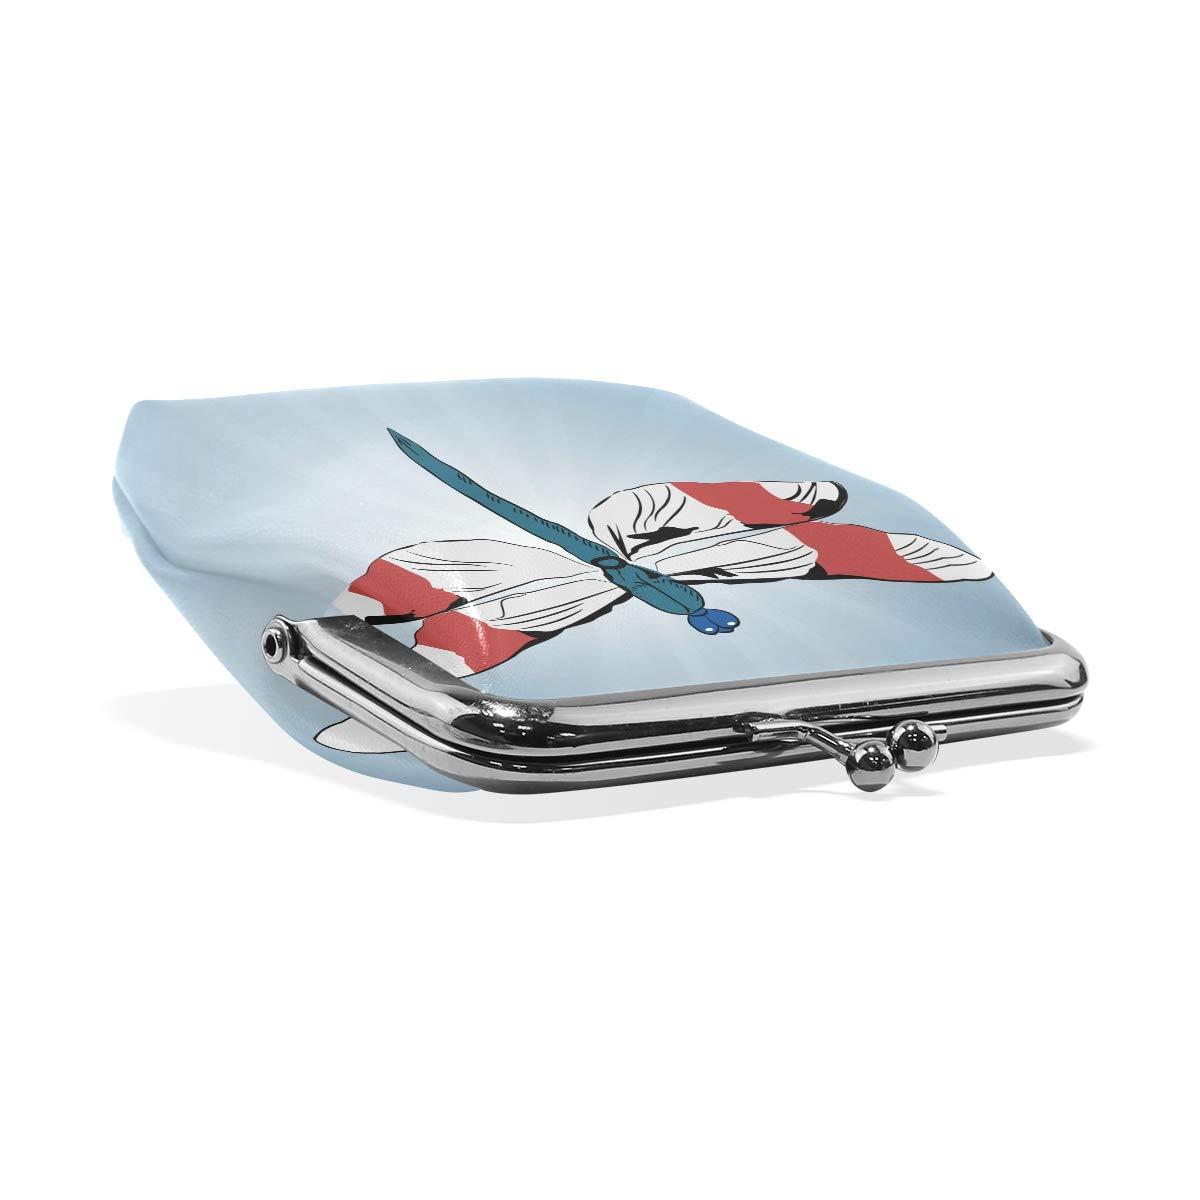 LALATOP Dragonfly Womens Coin Pouch Purse wallet Card Holder Clutch Handbag